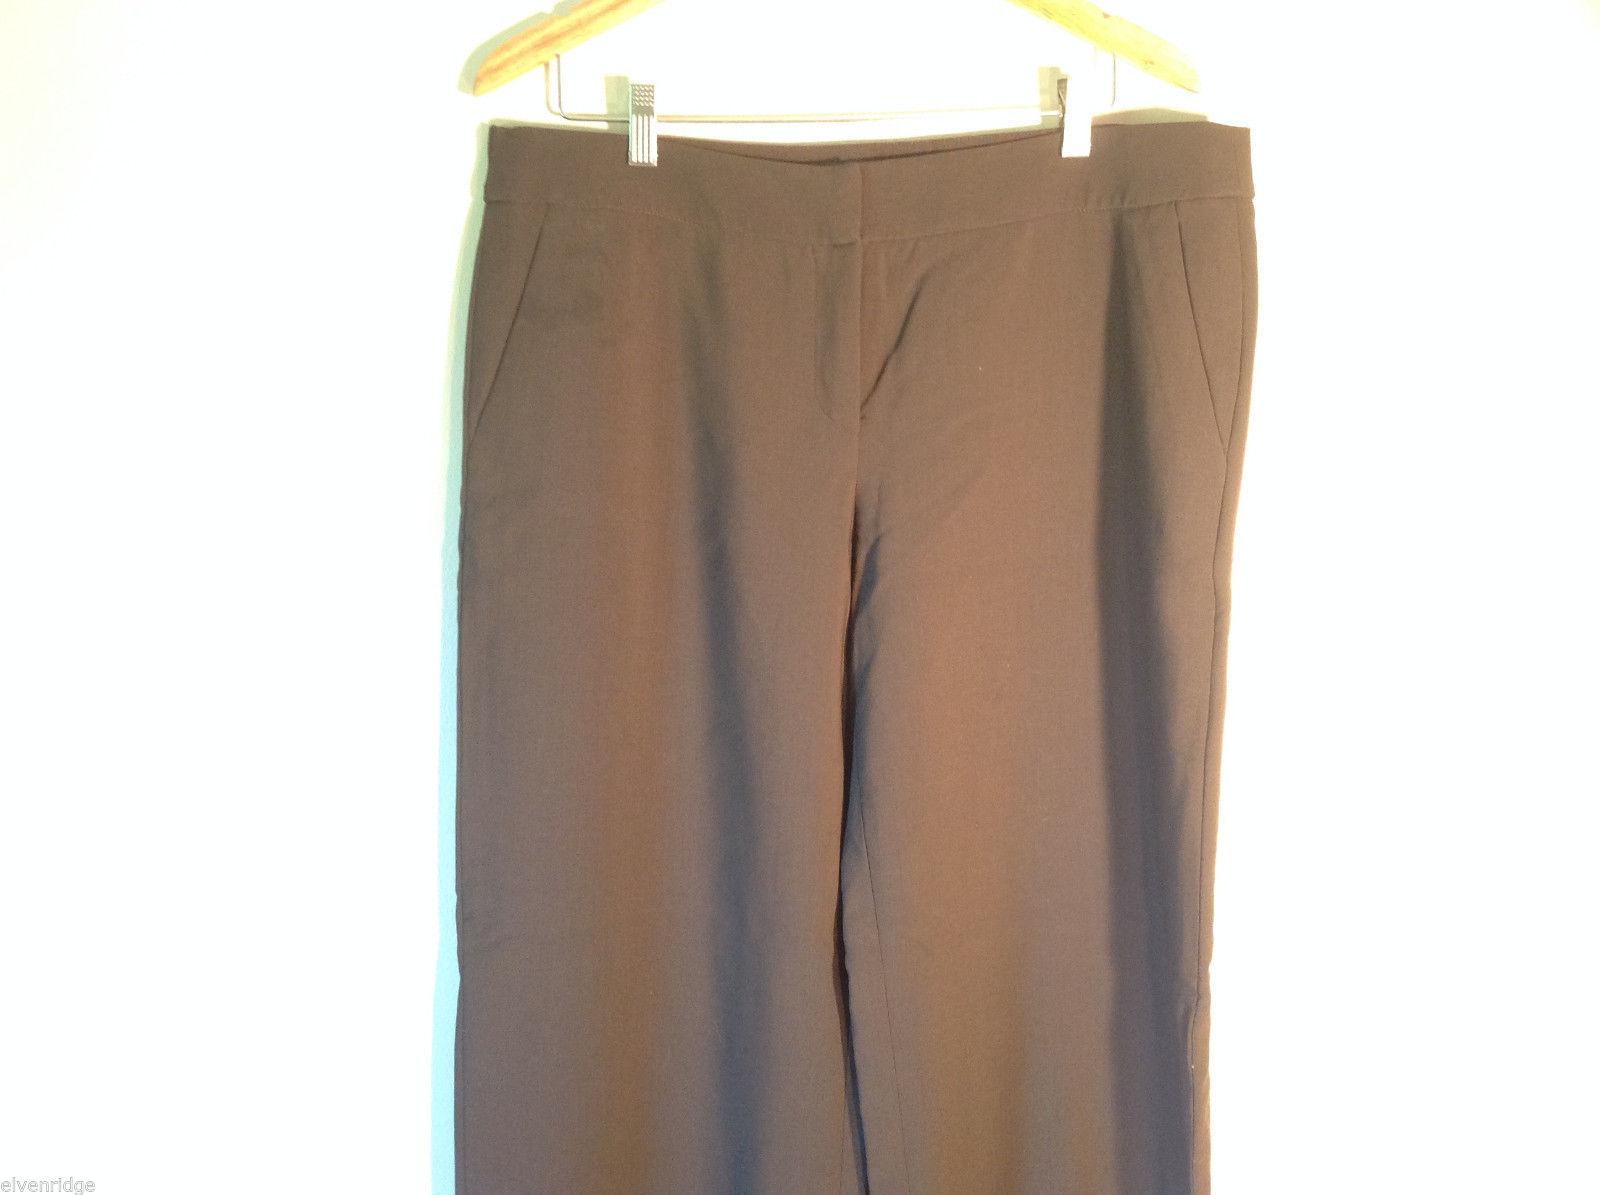 Womens Giorgio Armani Dark Brown Flat Front Trouser Dress Pants Slacks ITALY image 2